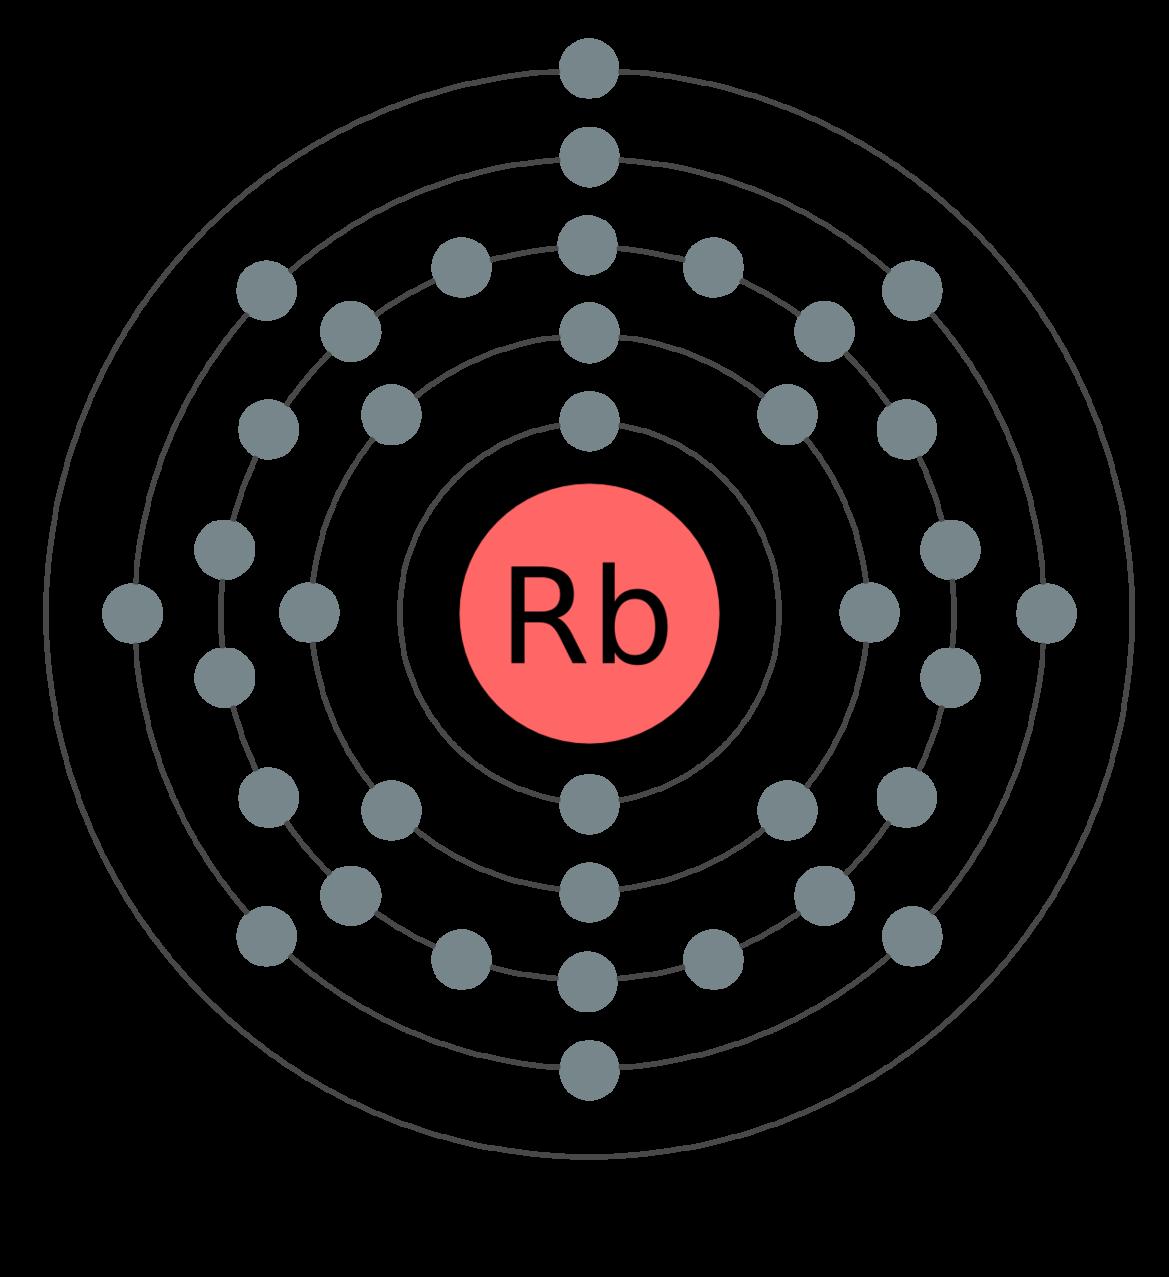 Rubidium Open Science Wiki FANDOM powered by Wikia